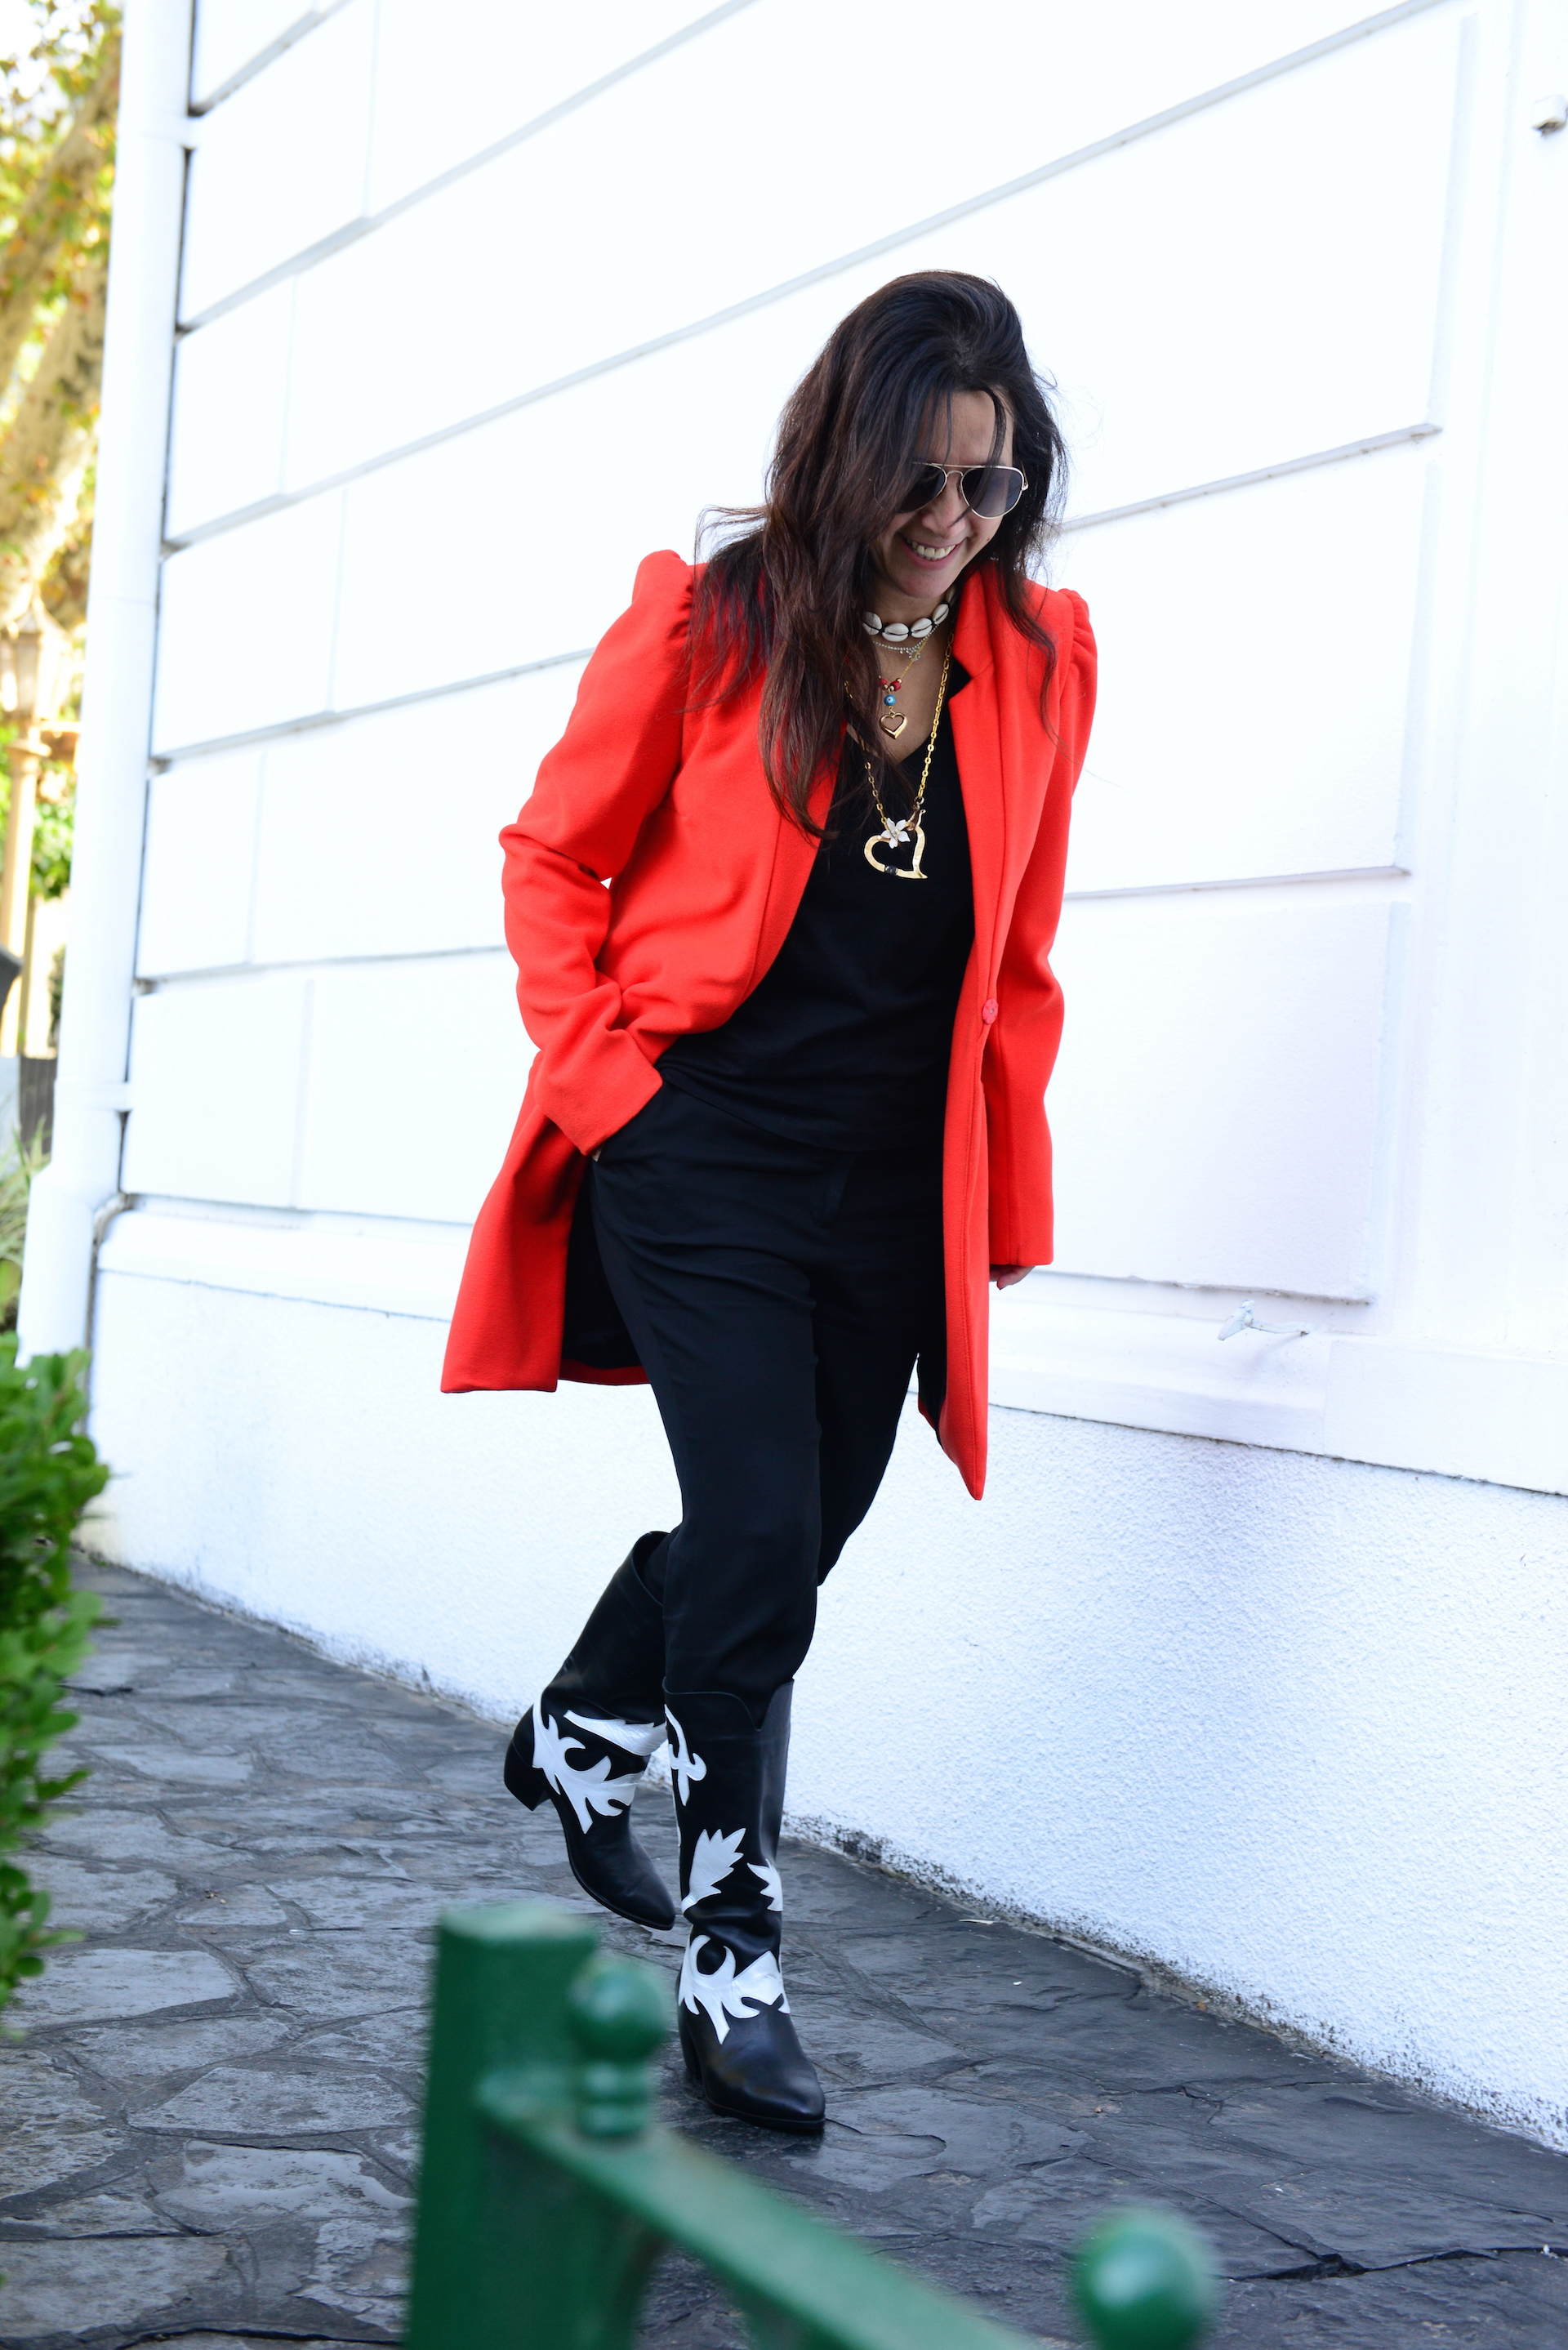 Marité Rizzo con botas texanas de Le Loup. Foto: Ale Carra/ParaTi